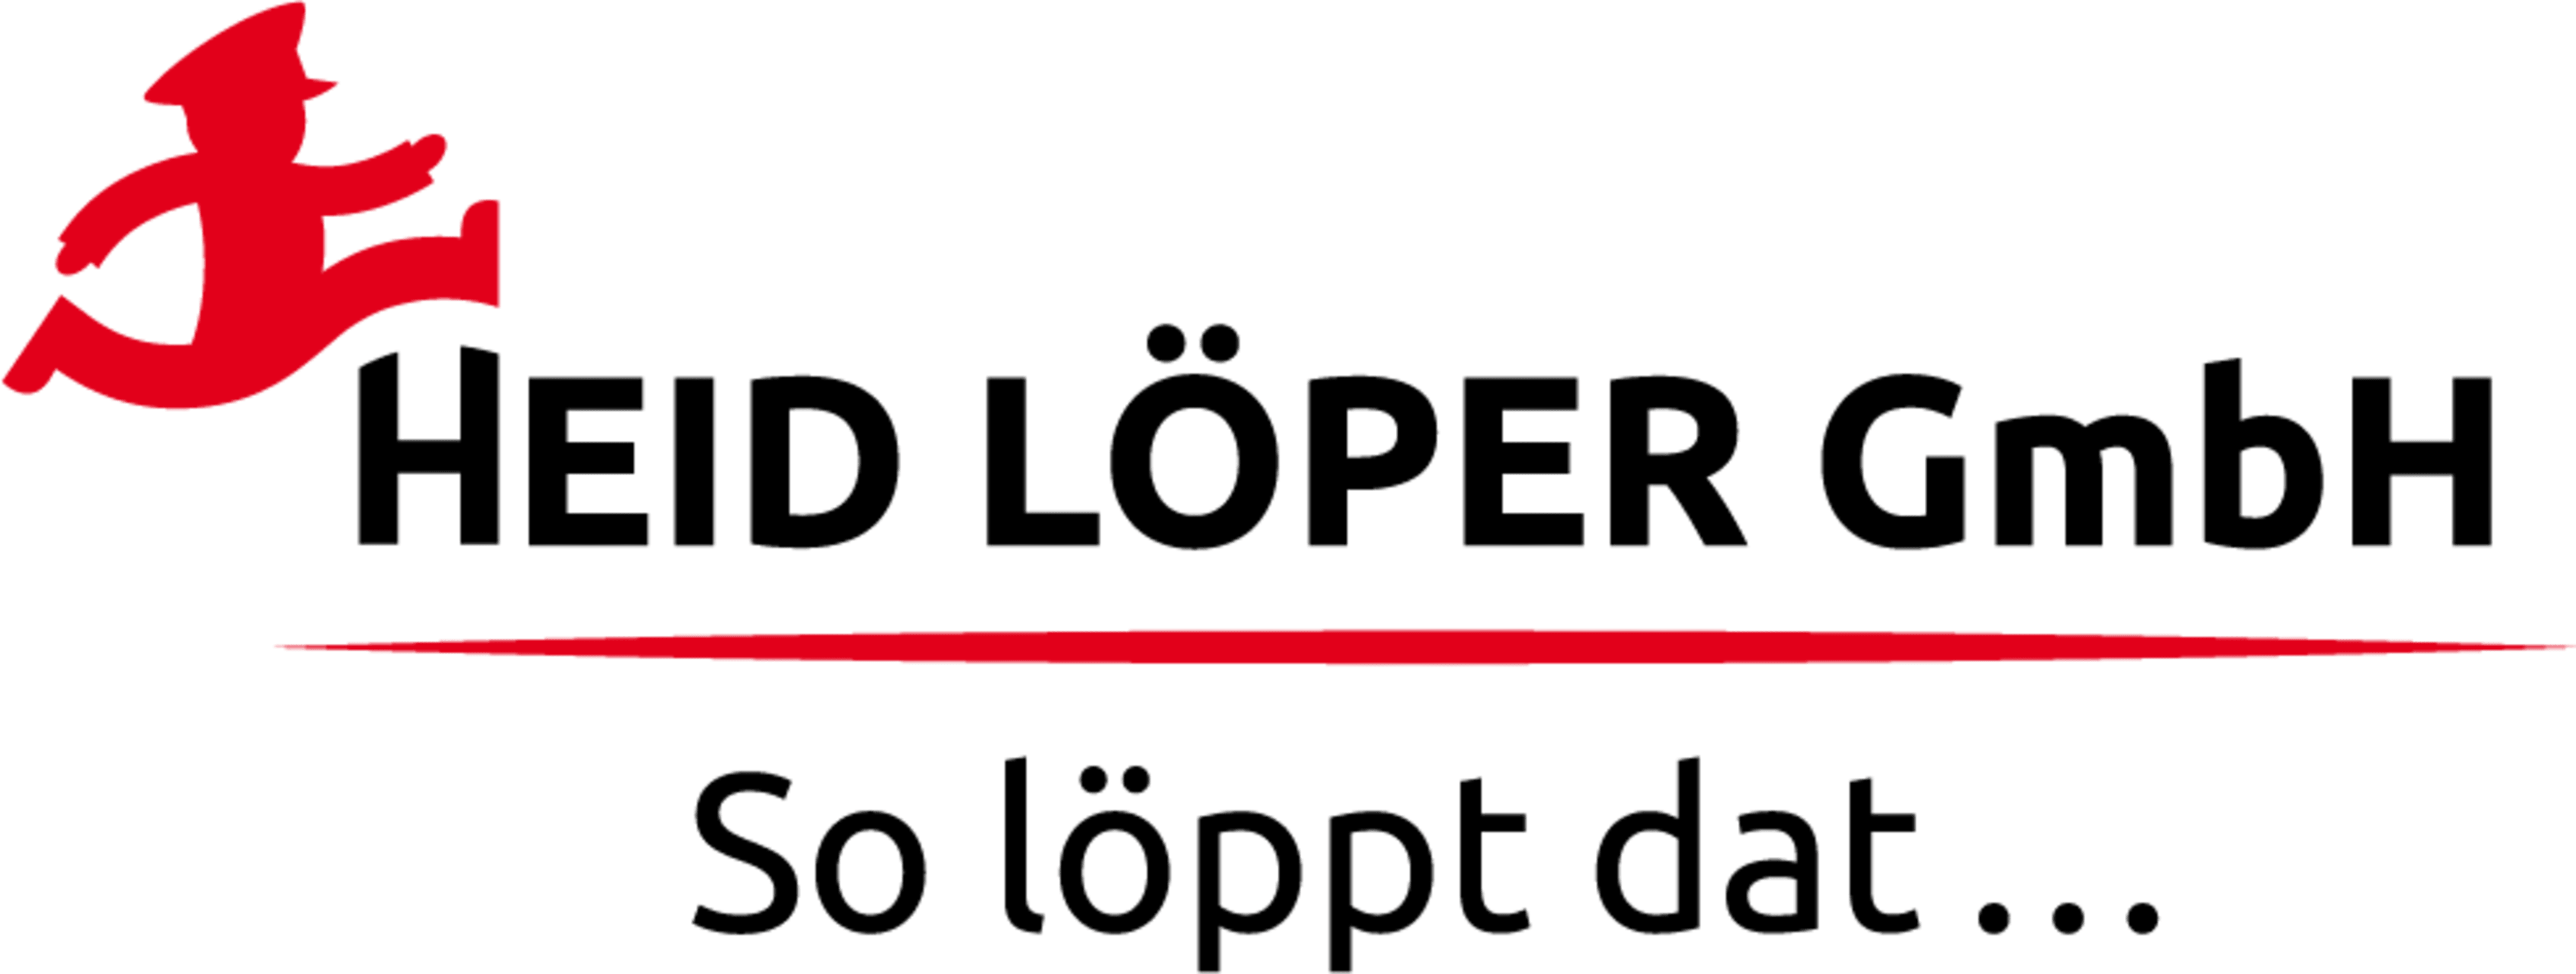 logo Heid Löper GmbH